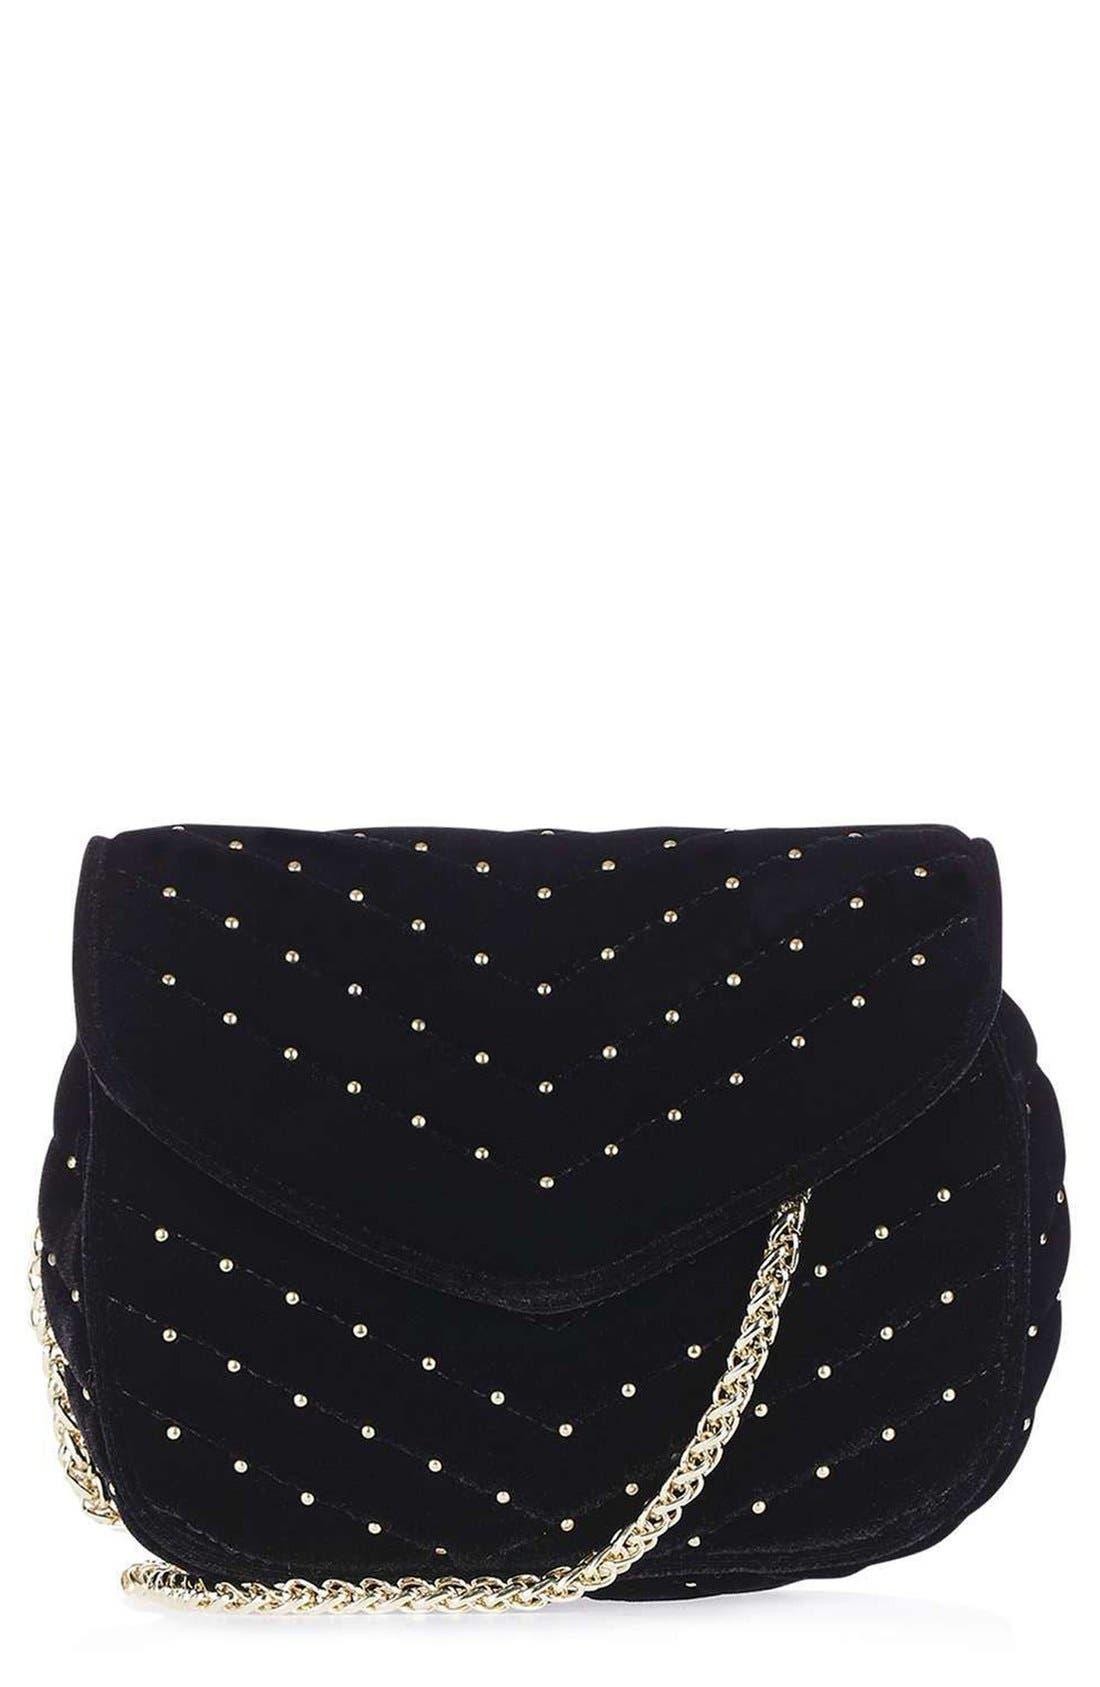 TOPSHOP, Embellished Velvet Crossbody Bag, Main thumbnail 1, color, 001